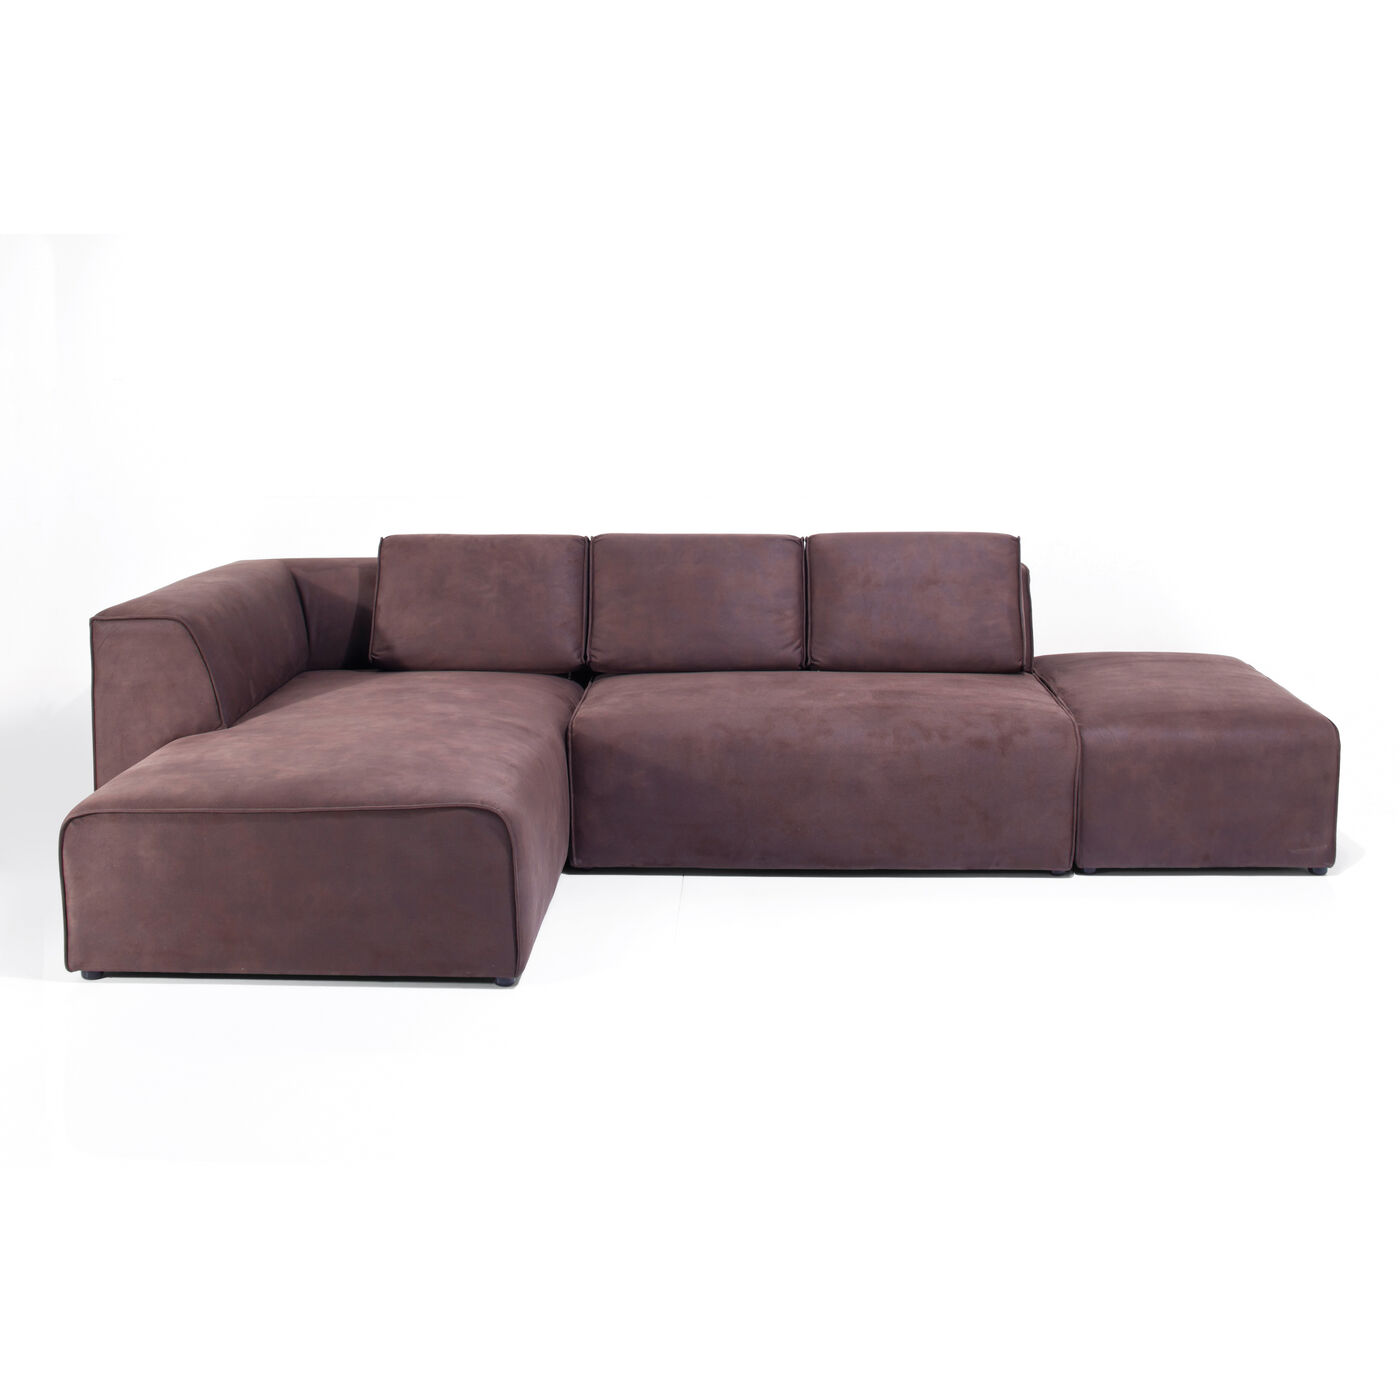 Sofa Infinity Antique 74 Ottomane Left Brown